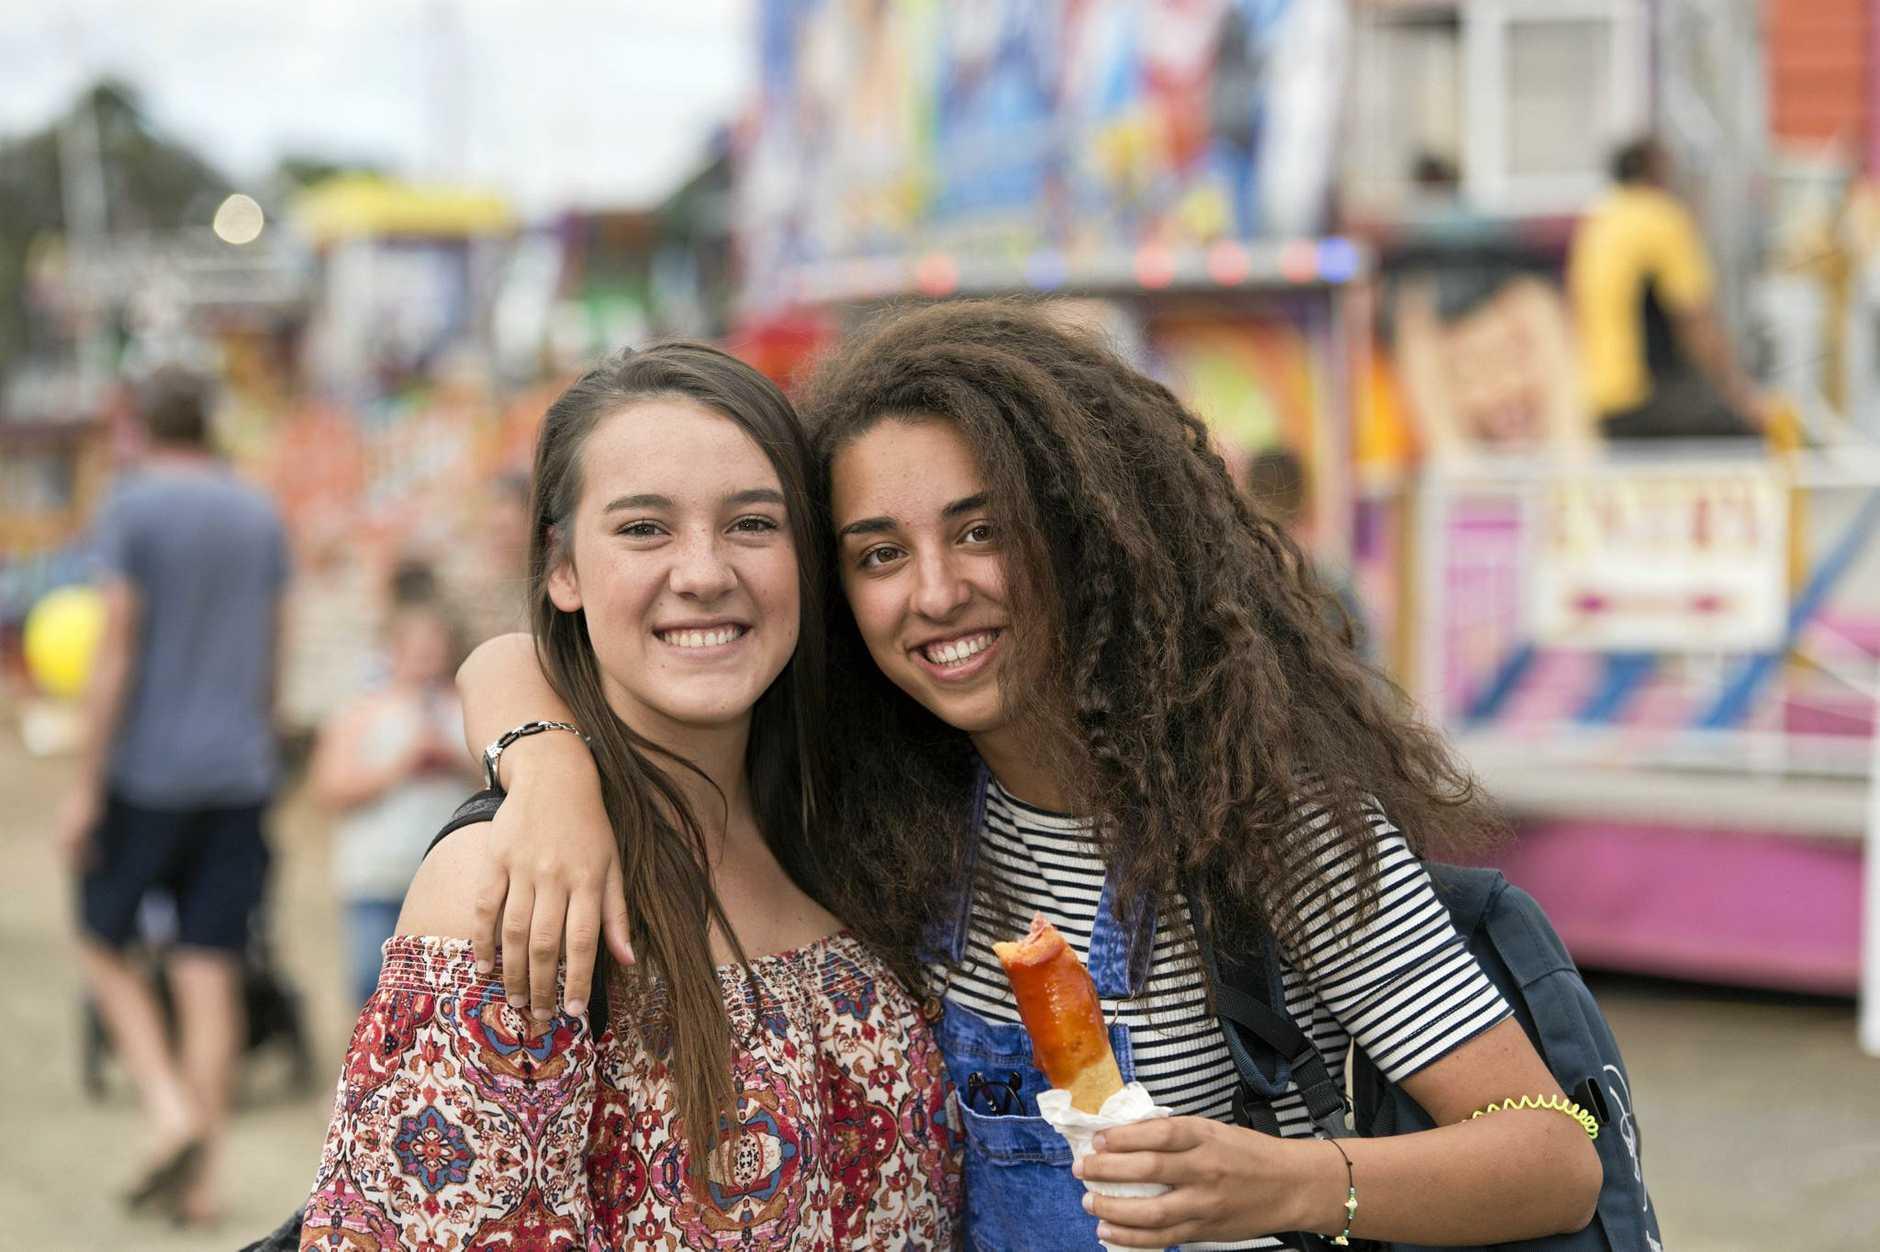 Renske Van Derwalt (left) and Anna Condotta in sideshow alley at Heritage Bank Toowoomba Royal Show, Saturday, April 1, 2017.